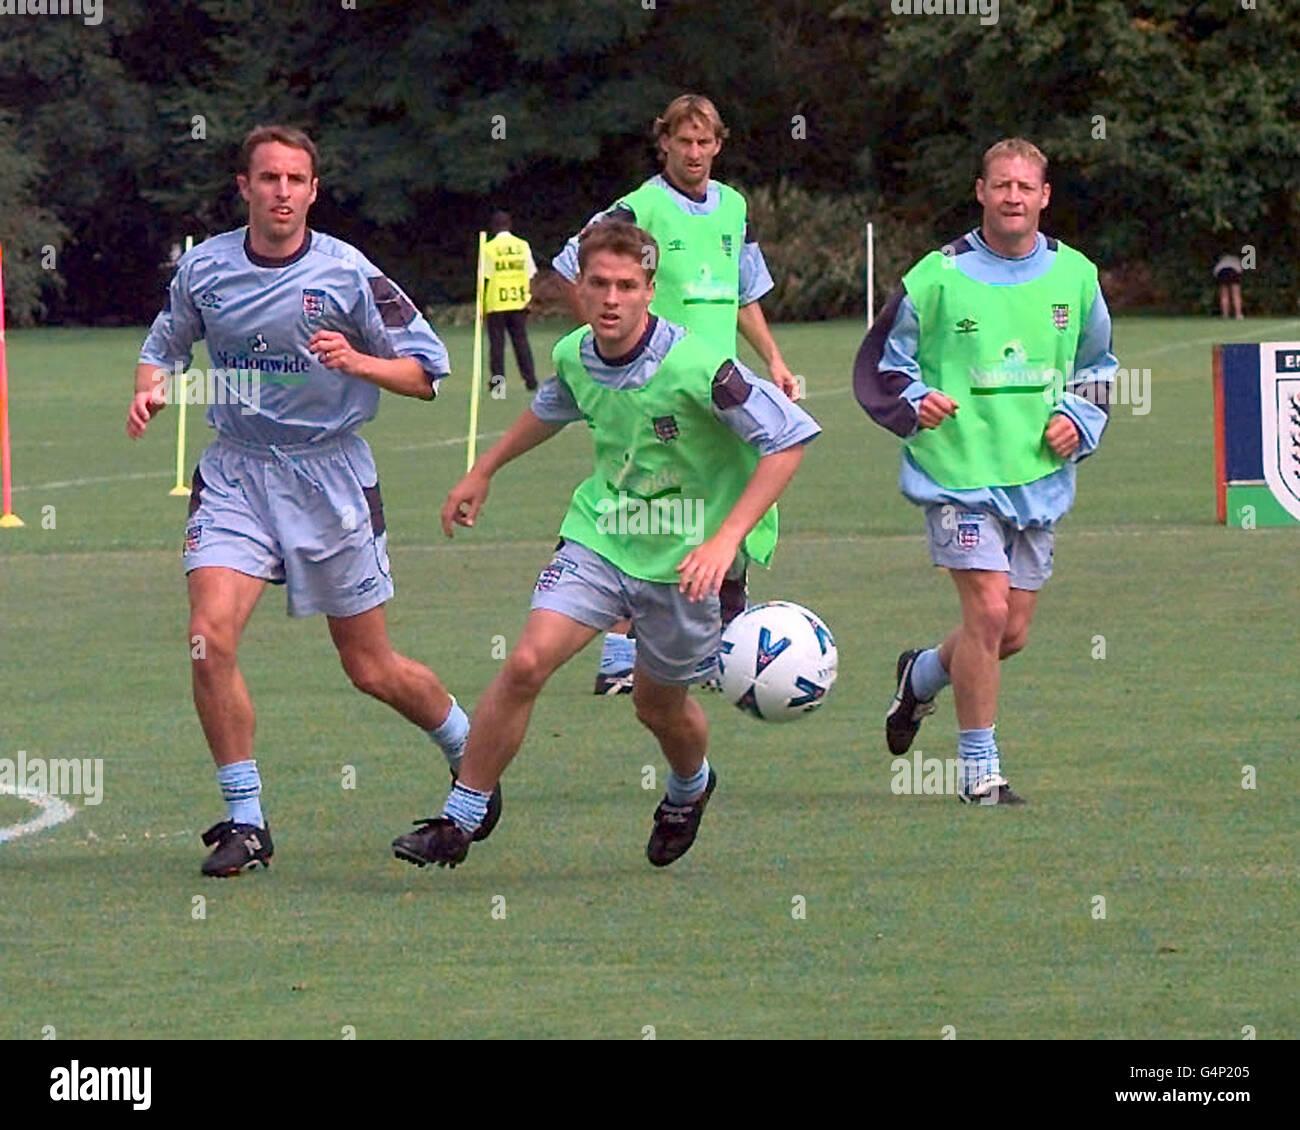 SOCCER England Training 3 - Stock Image